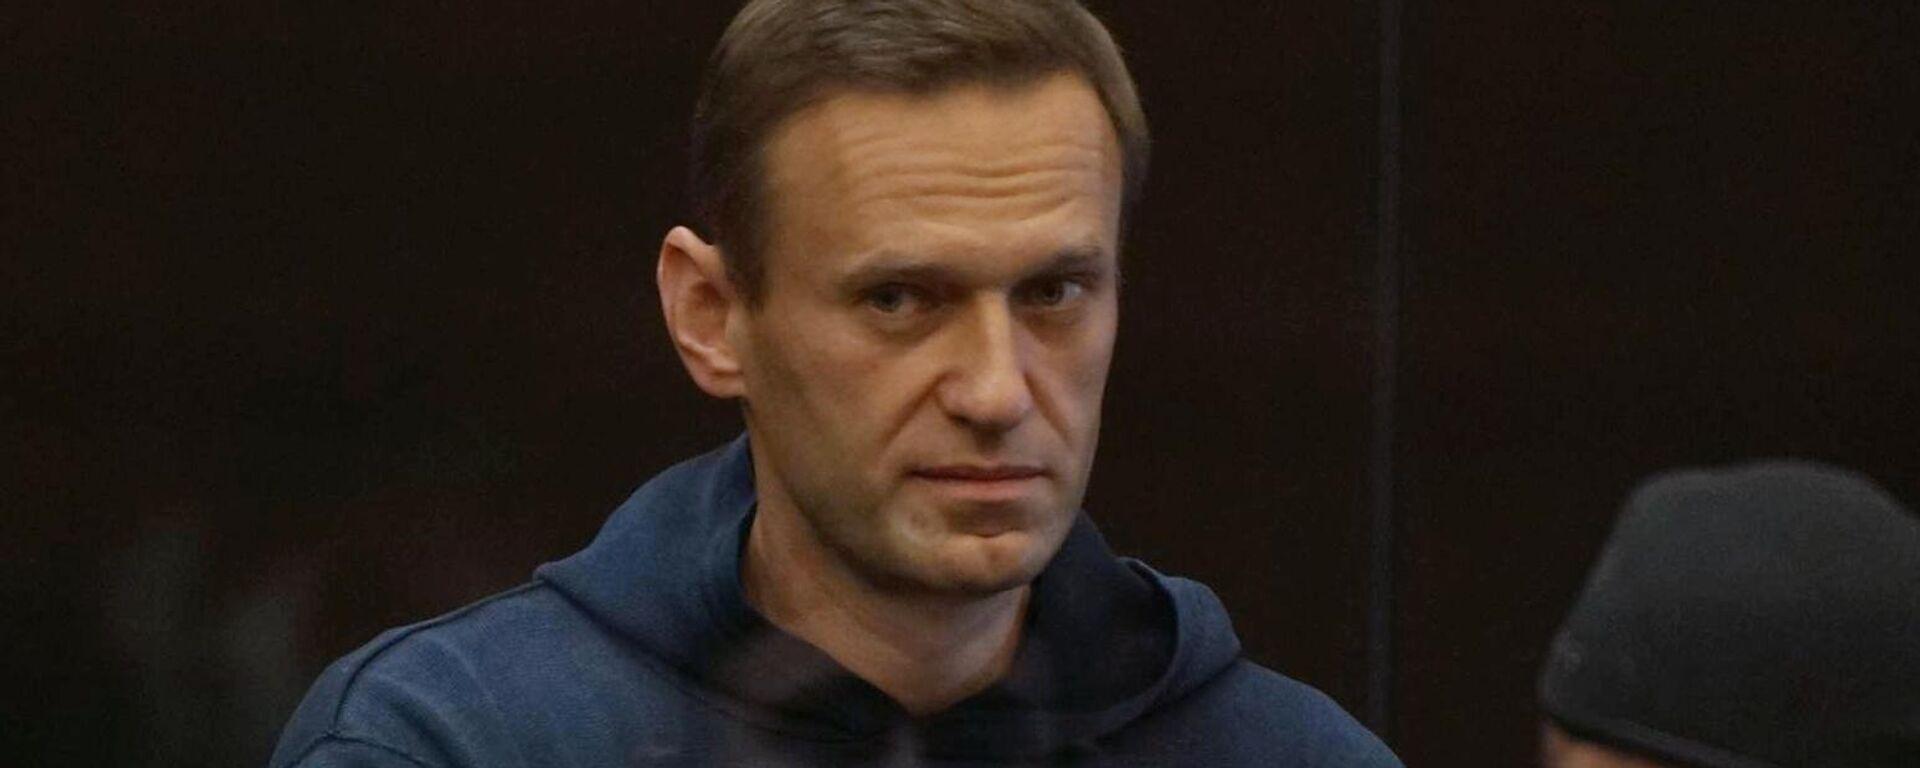 Alexej Nawalny vor der Verkündung des Urteils - SNA, 1920, 03.02.2021